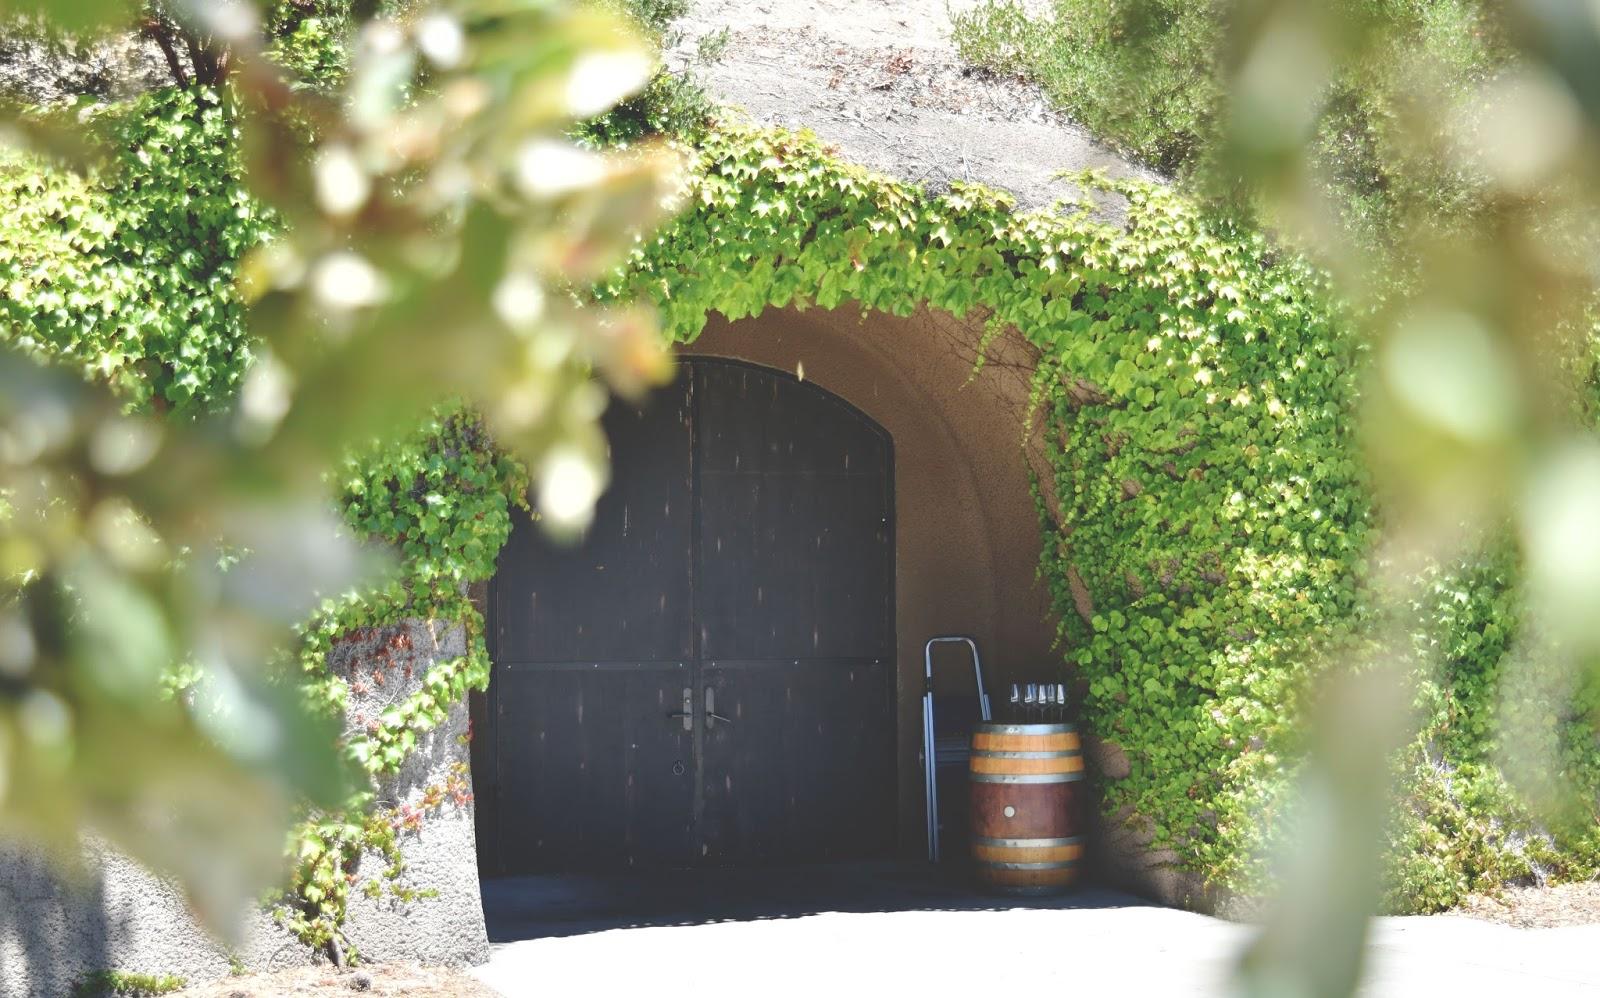 Caldwell winery in Napa, California